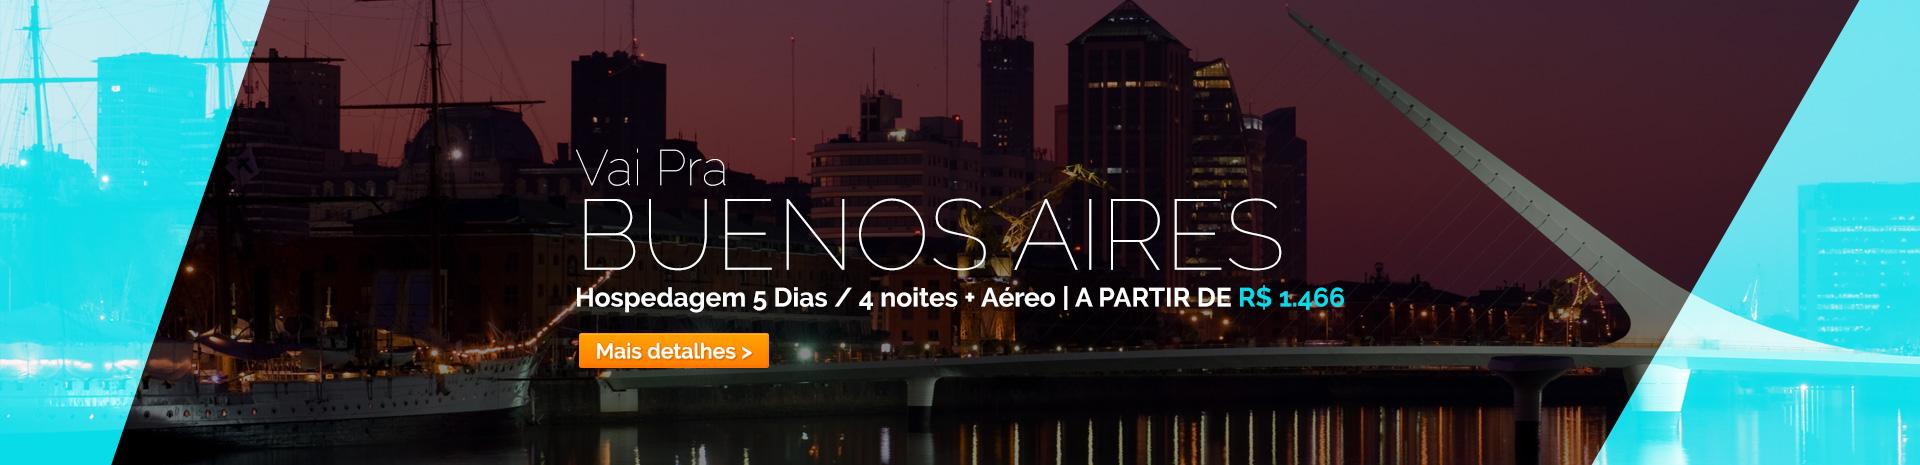 Vai pra Buenos Aires